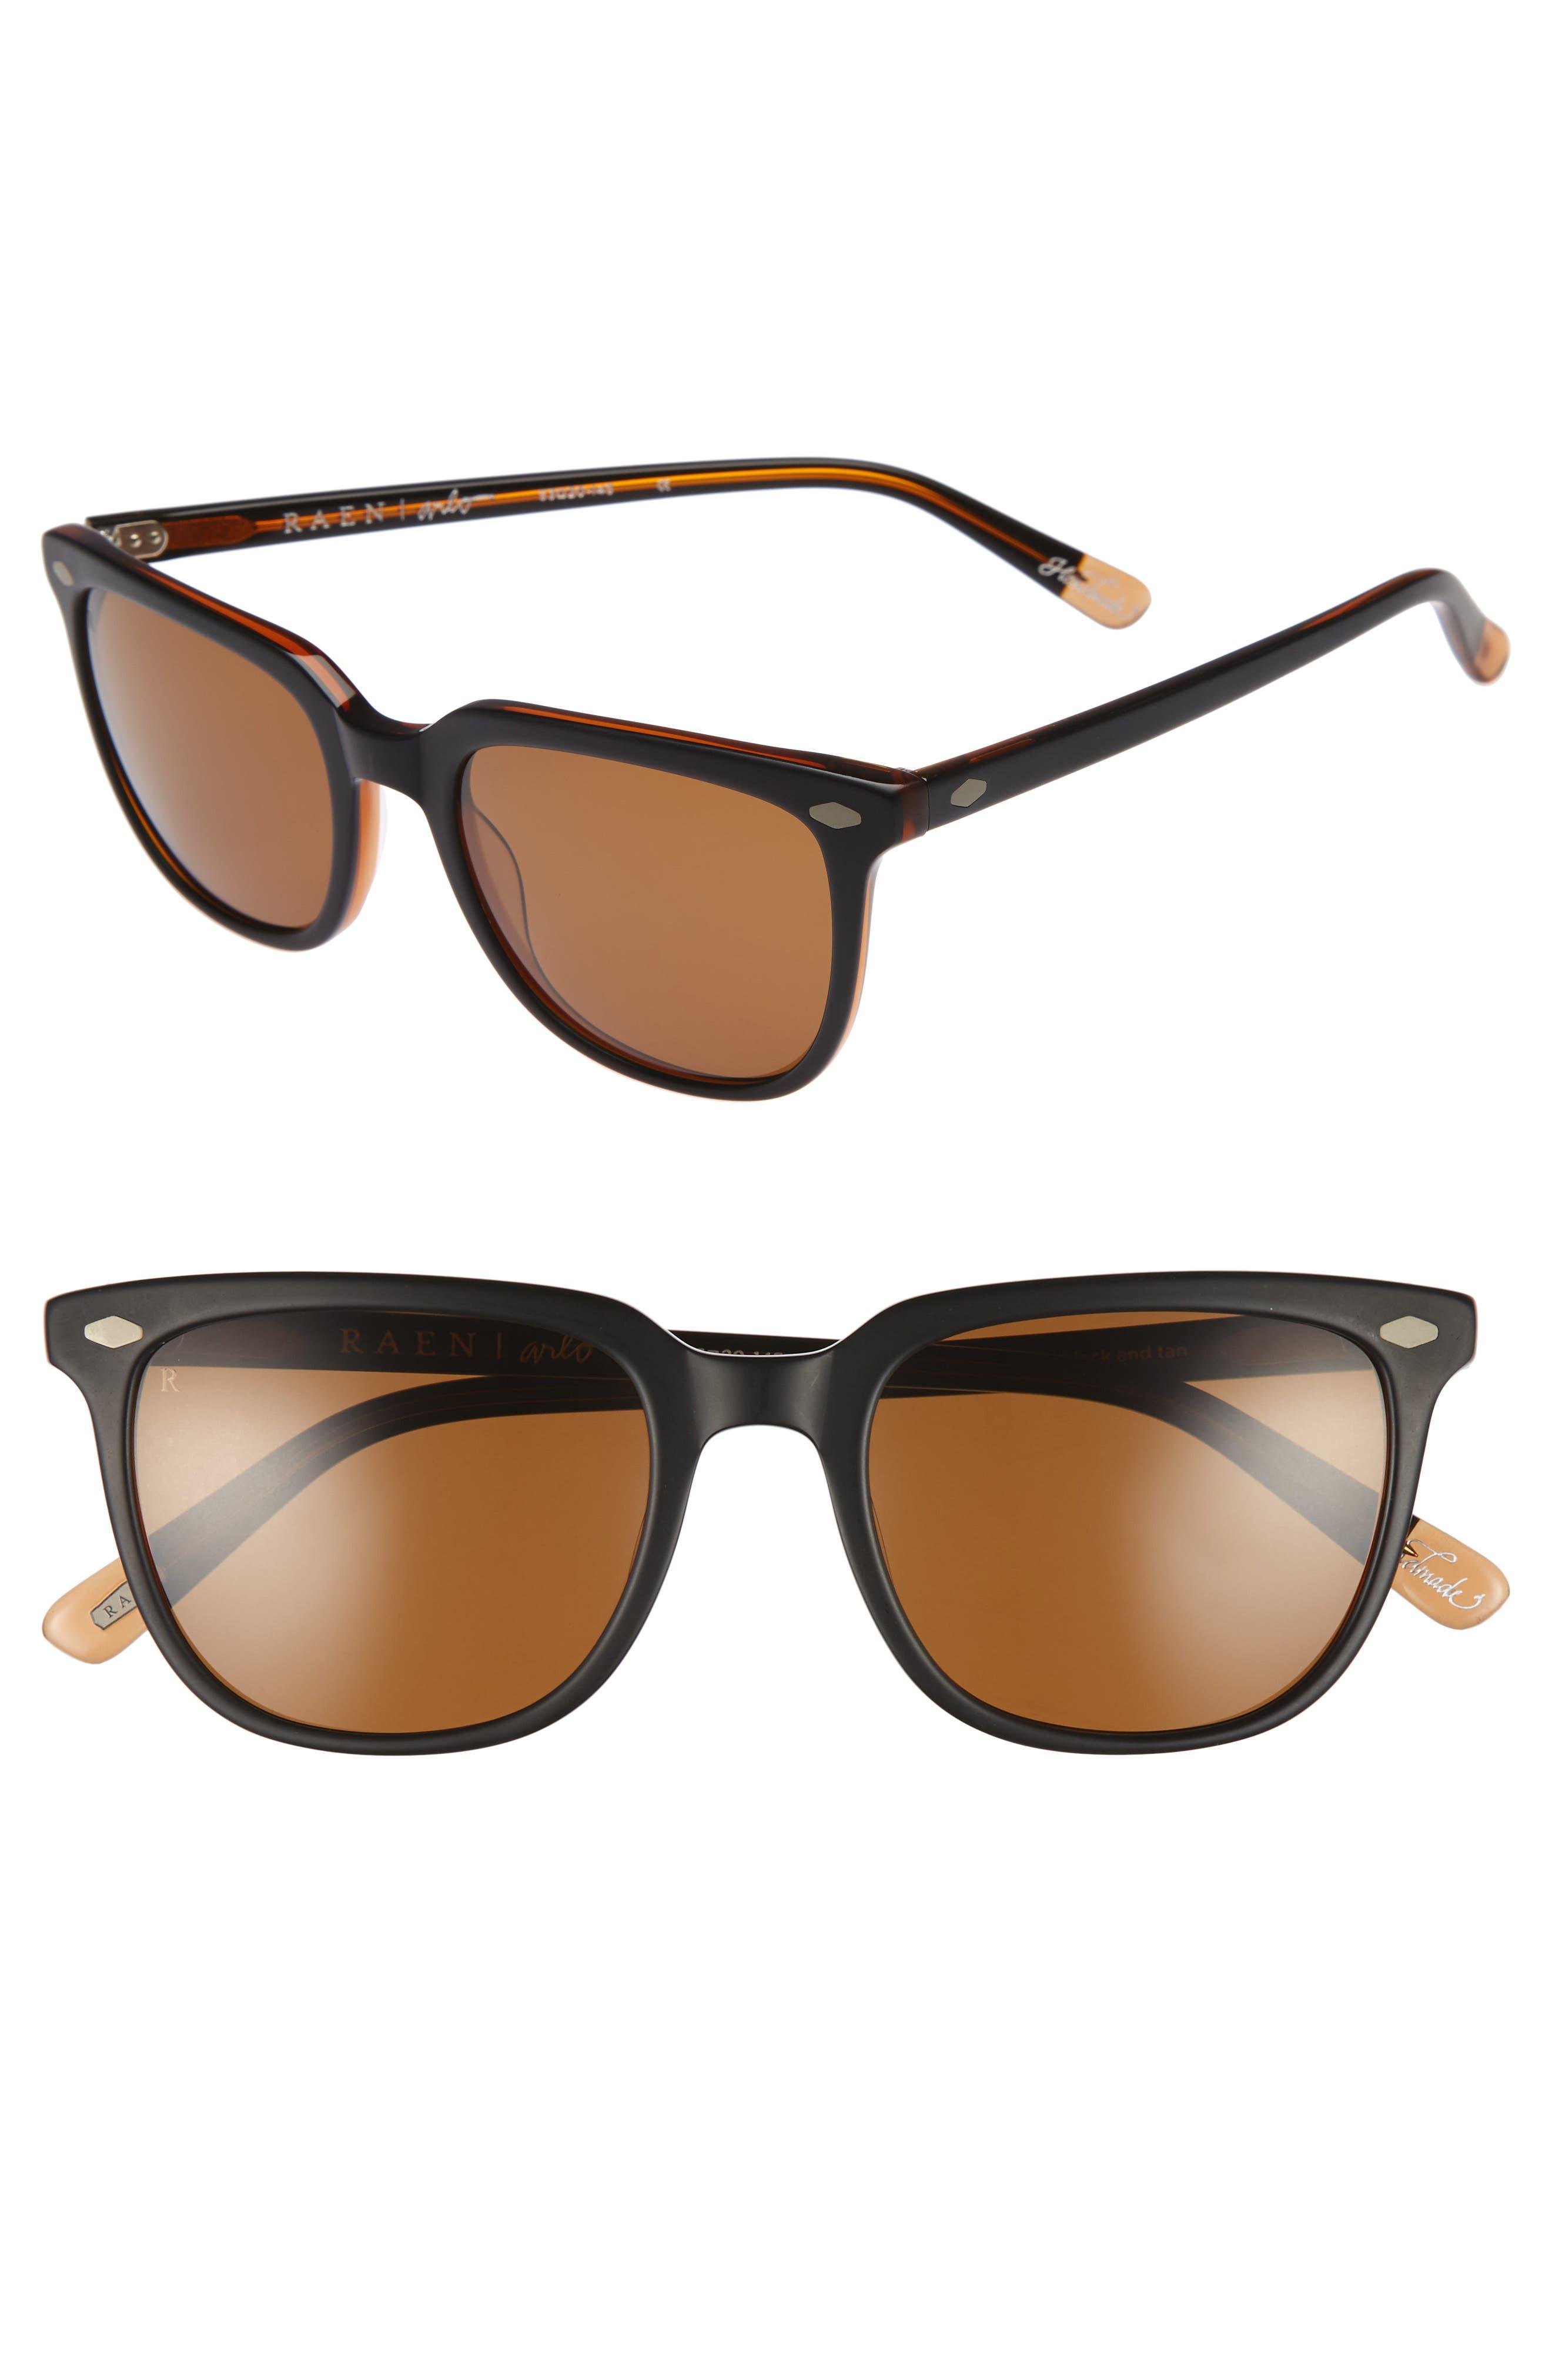 Arlo 53mm Polarized Sunglasses,                         Main,                         color, Black/ Tan/ Brown